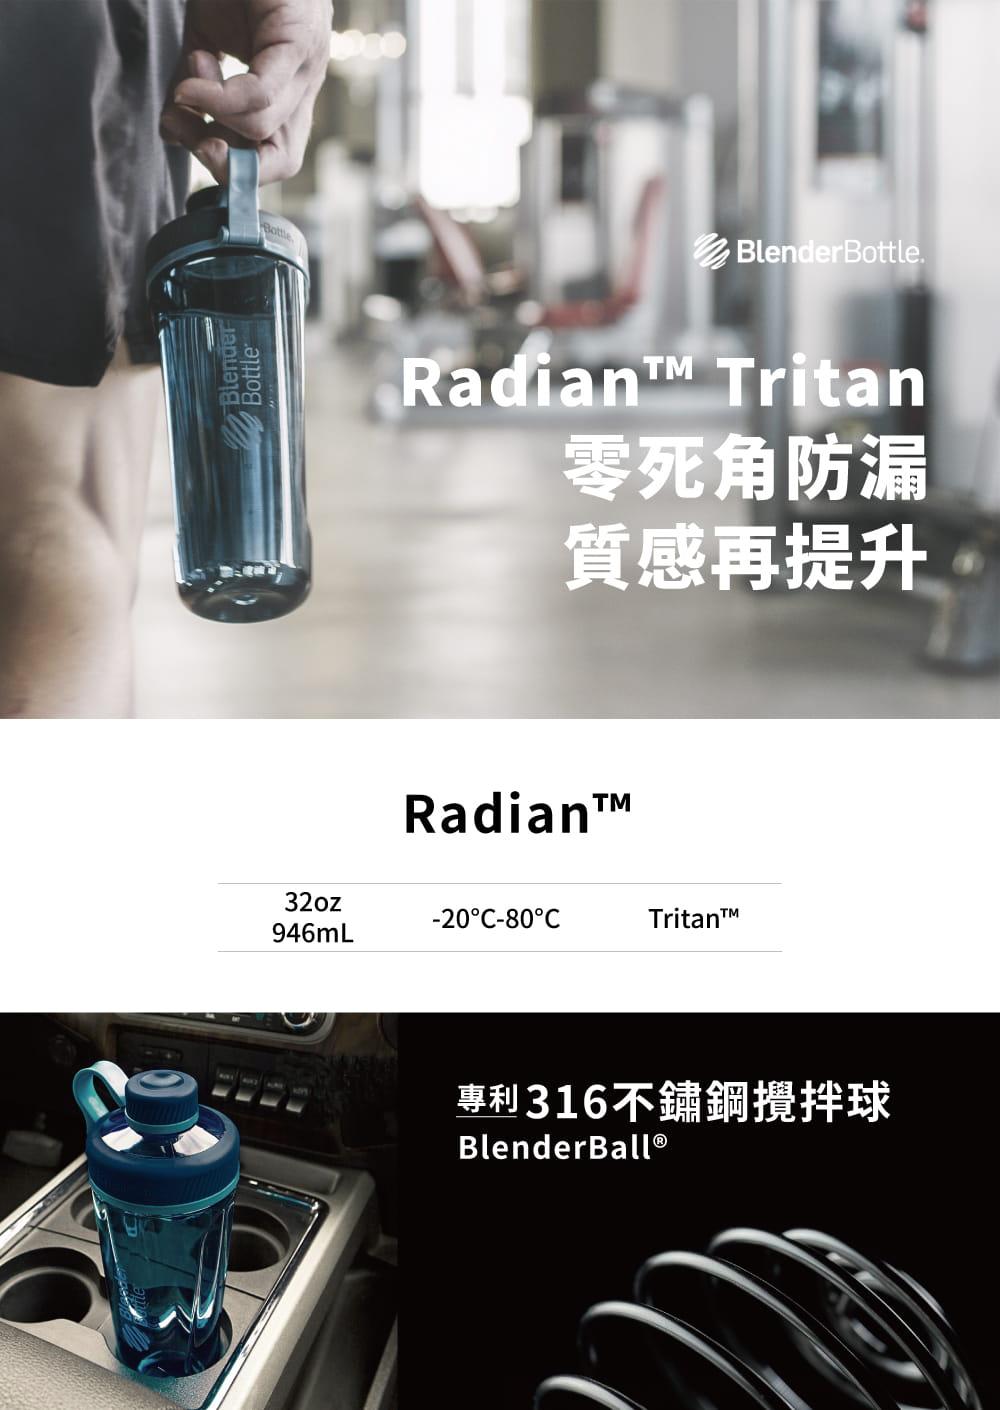 【Blender Bottle】Radian系列-Tritan旋蓋運動搖搖杯32oz(8色)+送mars隨手包 1